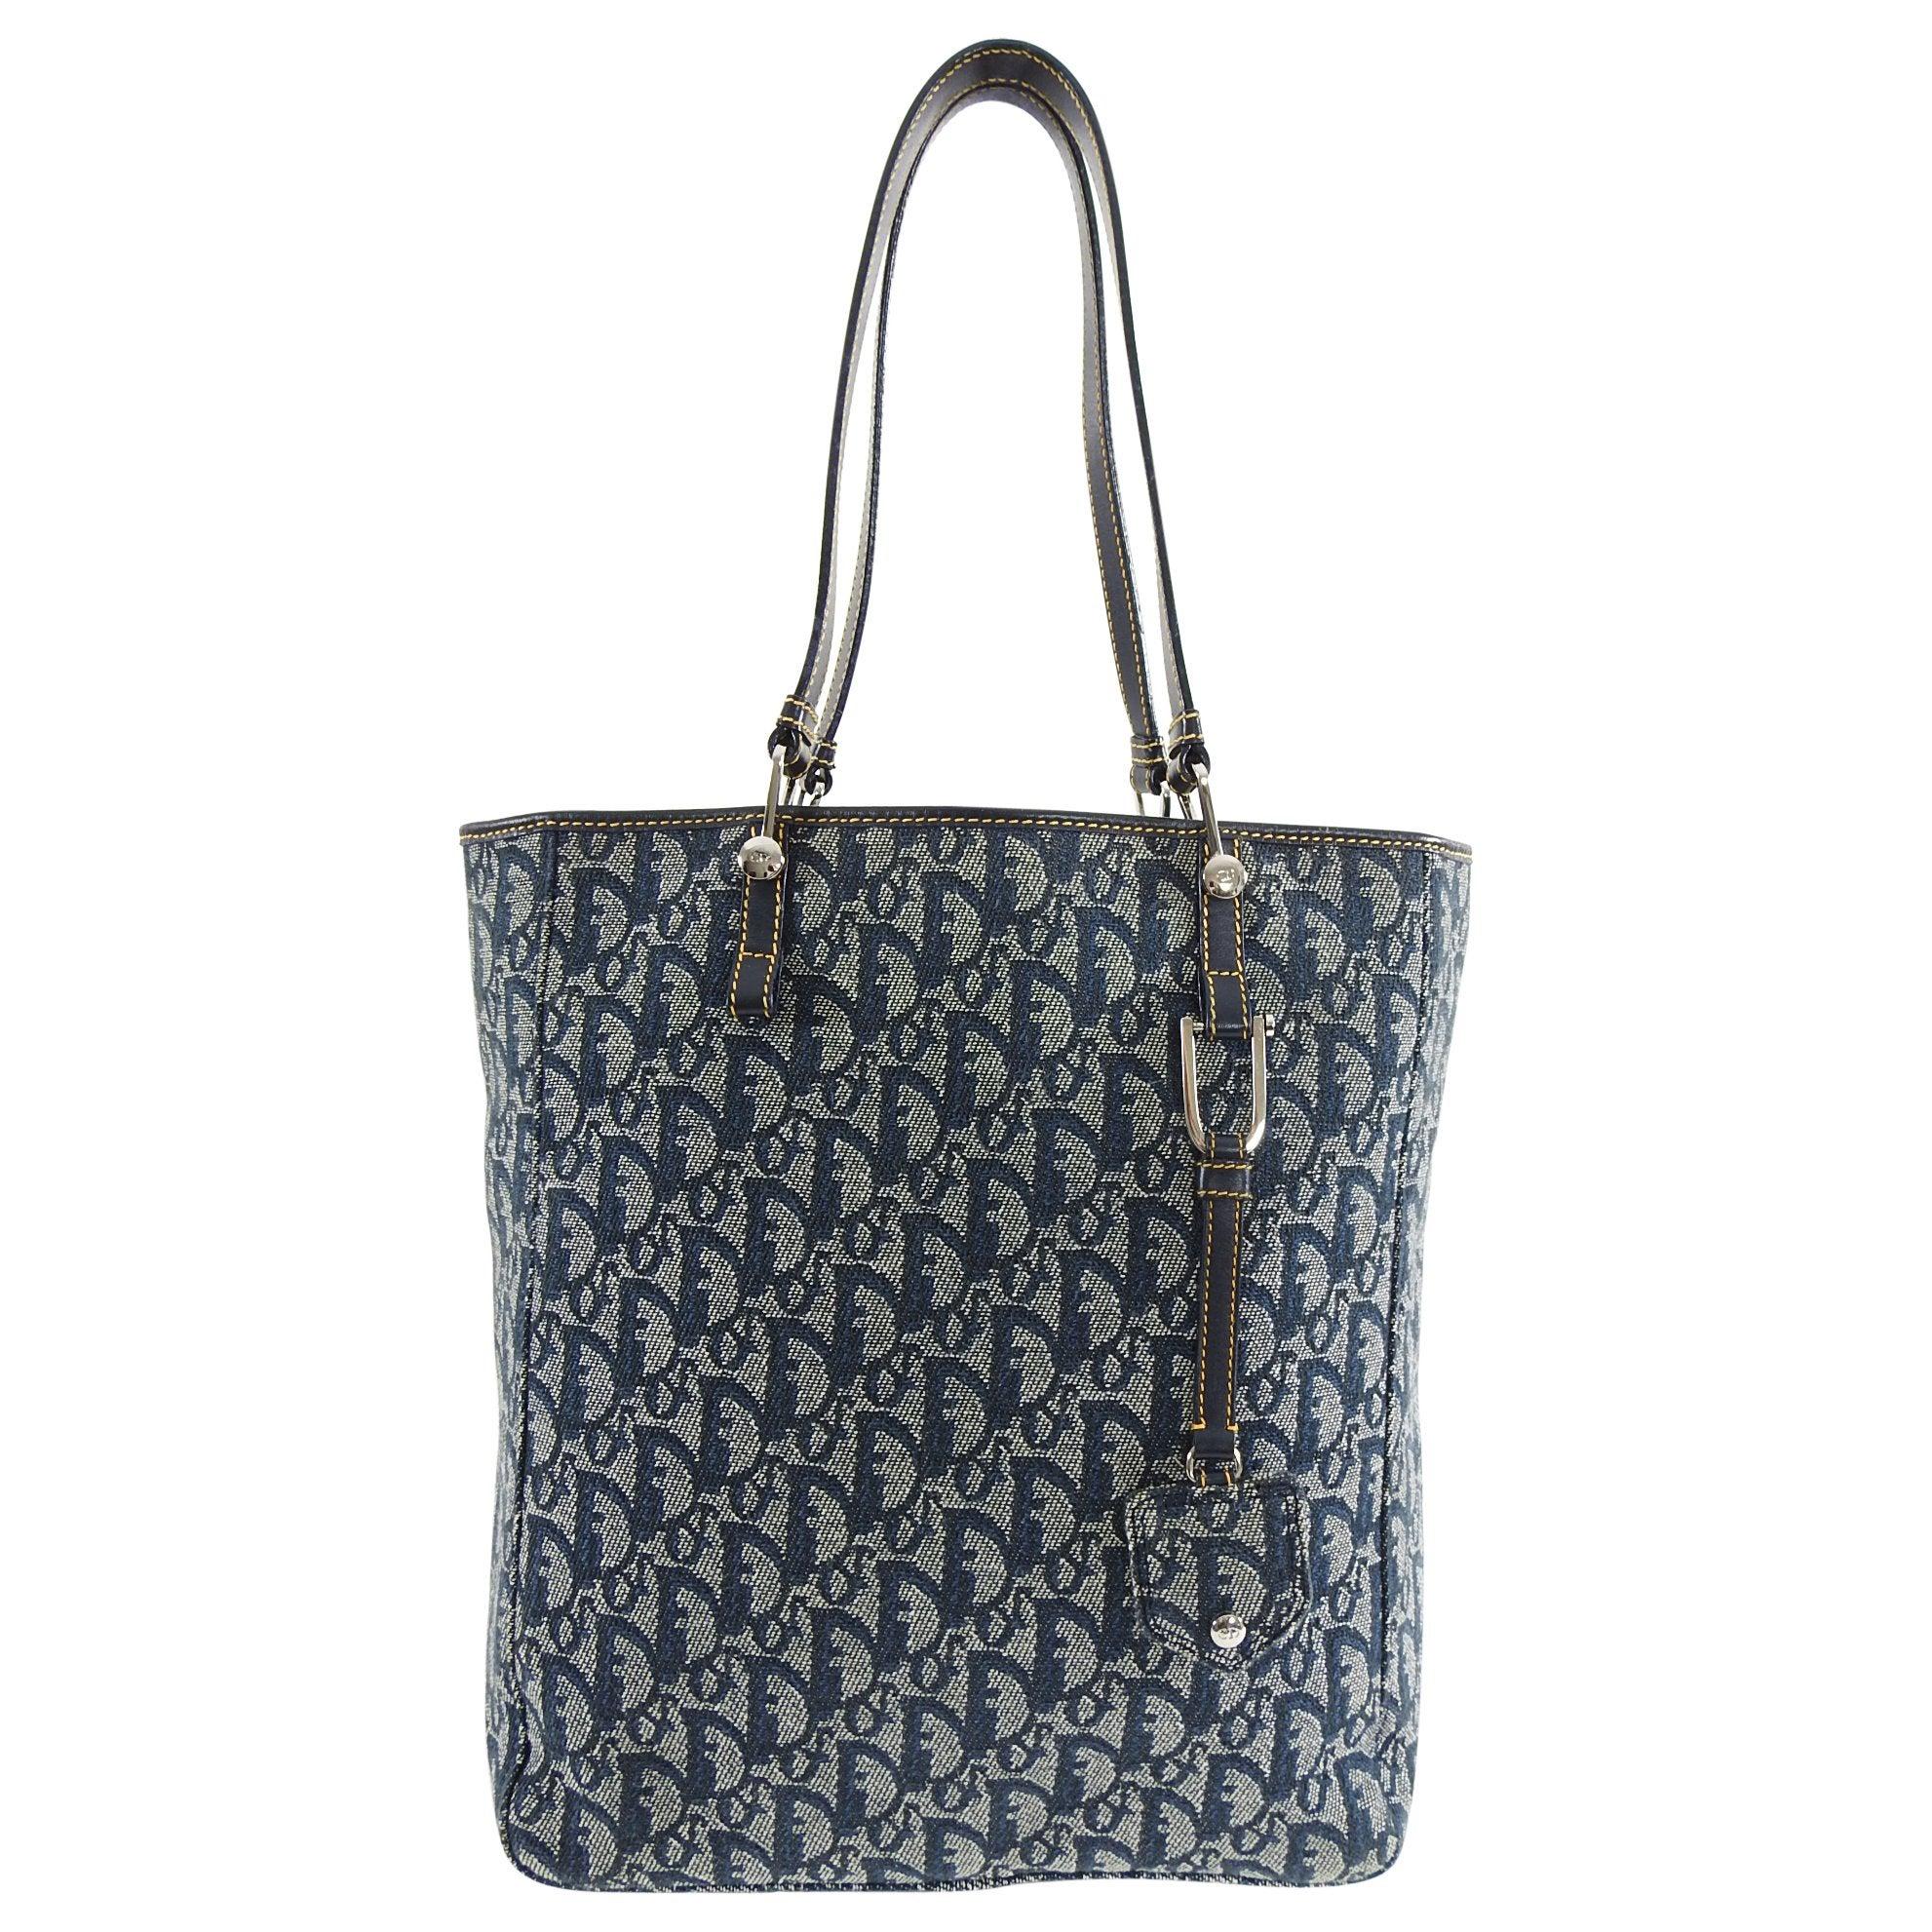 0d22bc5df9 Christian Dior Blue Monogram Canvas Saddle Tote Bag at 1stdibs